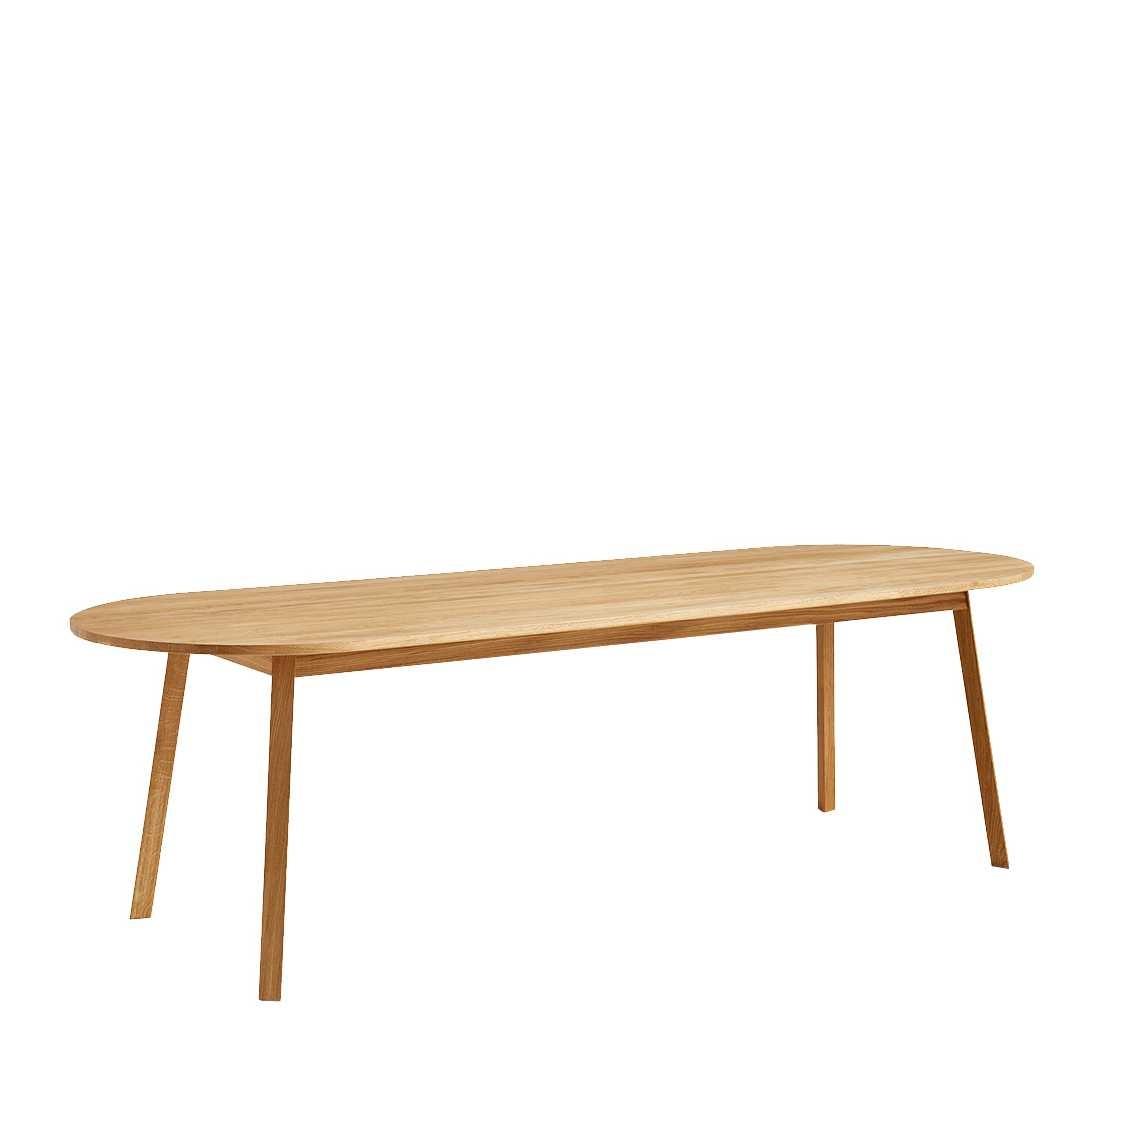 Wit Bankje Eettafel.Haytriangle Leg Bench Nordic New